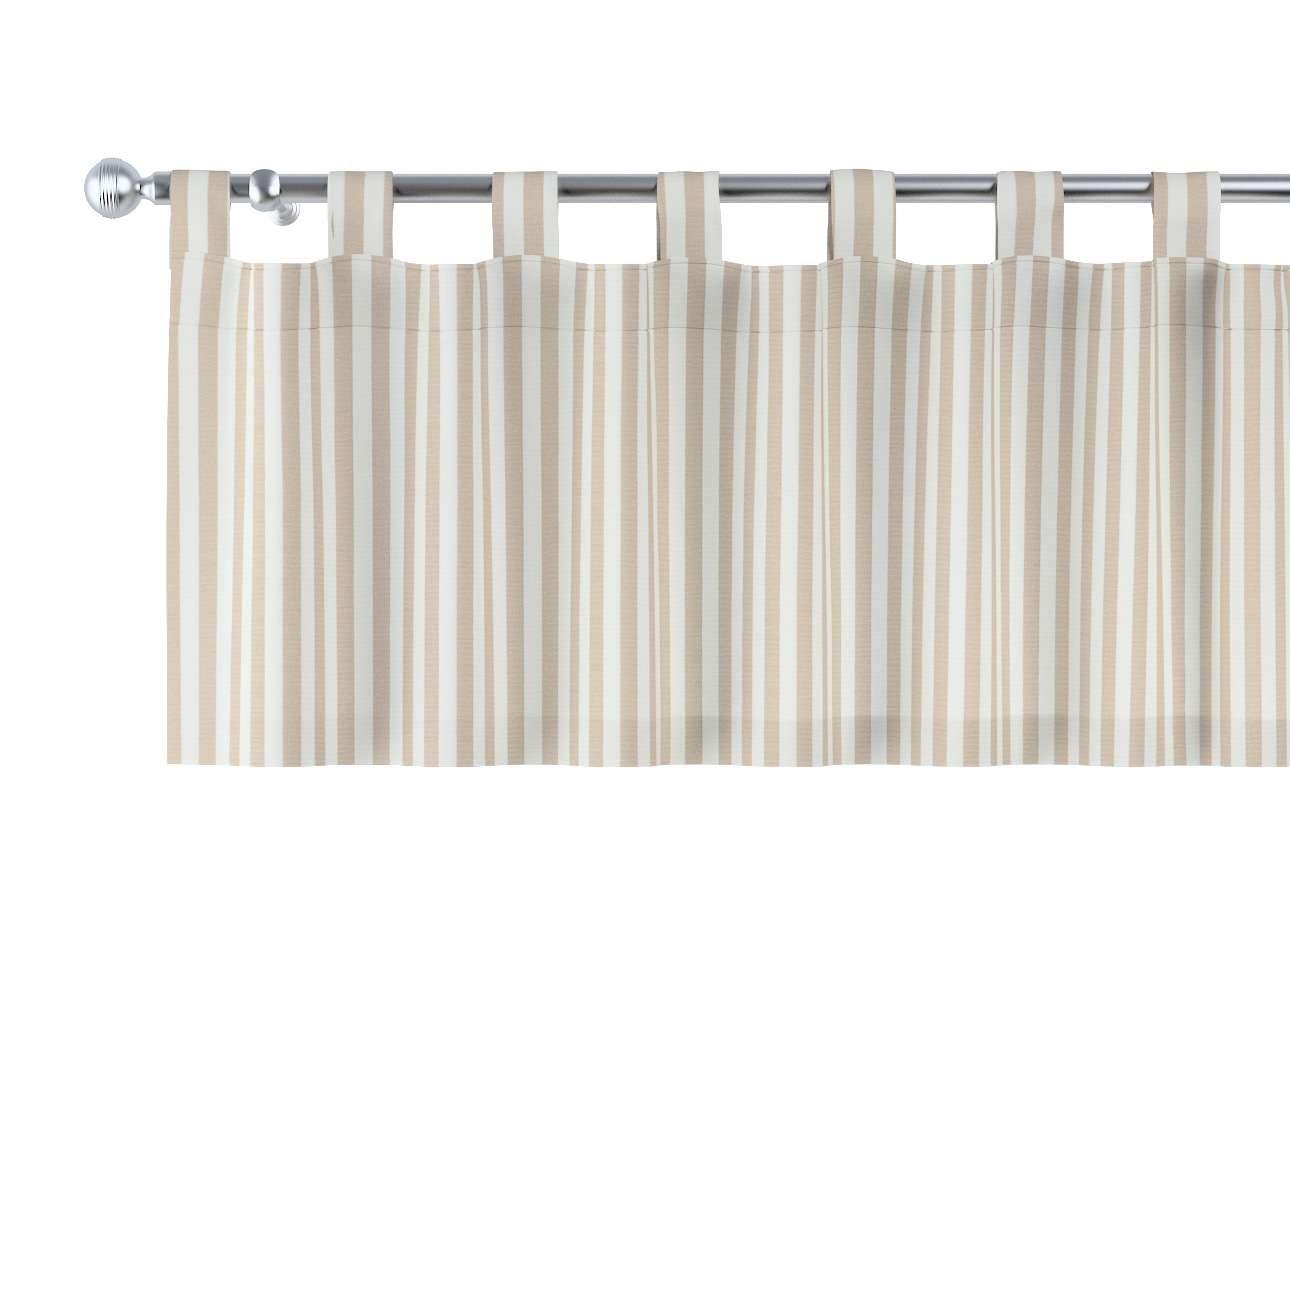 Lambrekin na szelkach 130x40cm w kolekcji Quadro, tkanina: 136-07